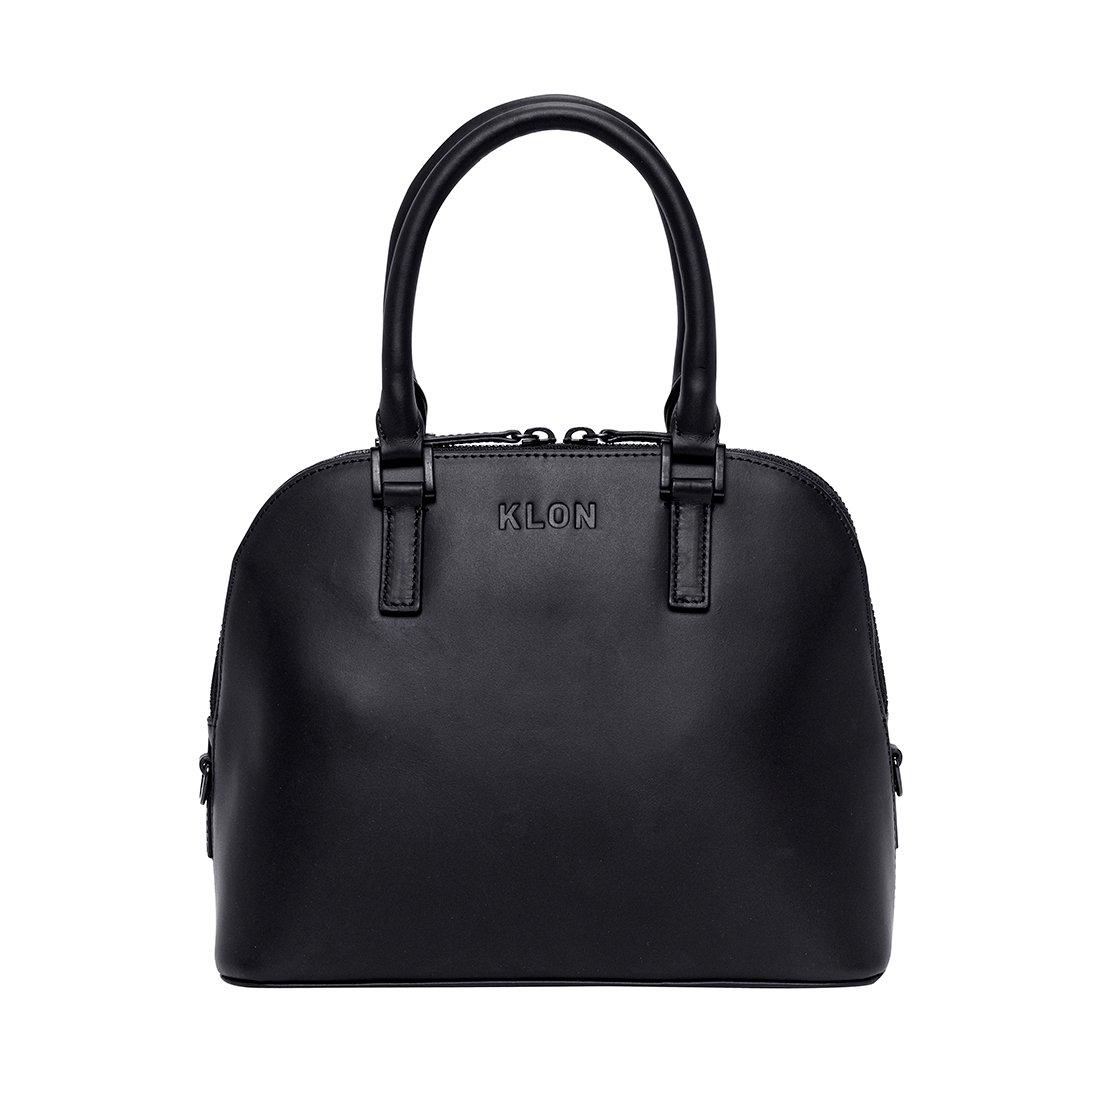 KLON ACTIVE LEATHER BAG -VNM- ROUND TYPE BLACK × BLACK